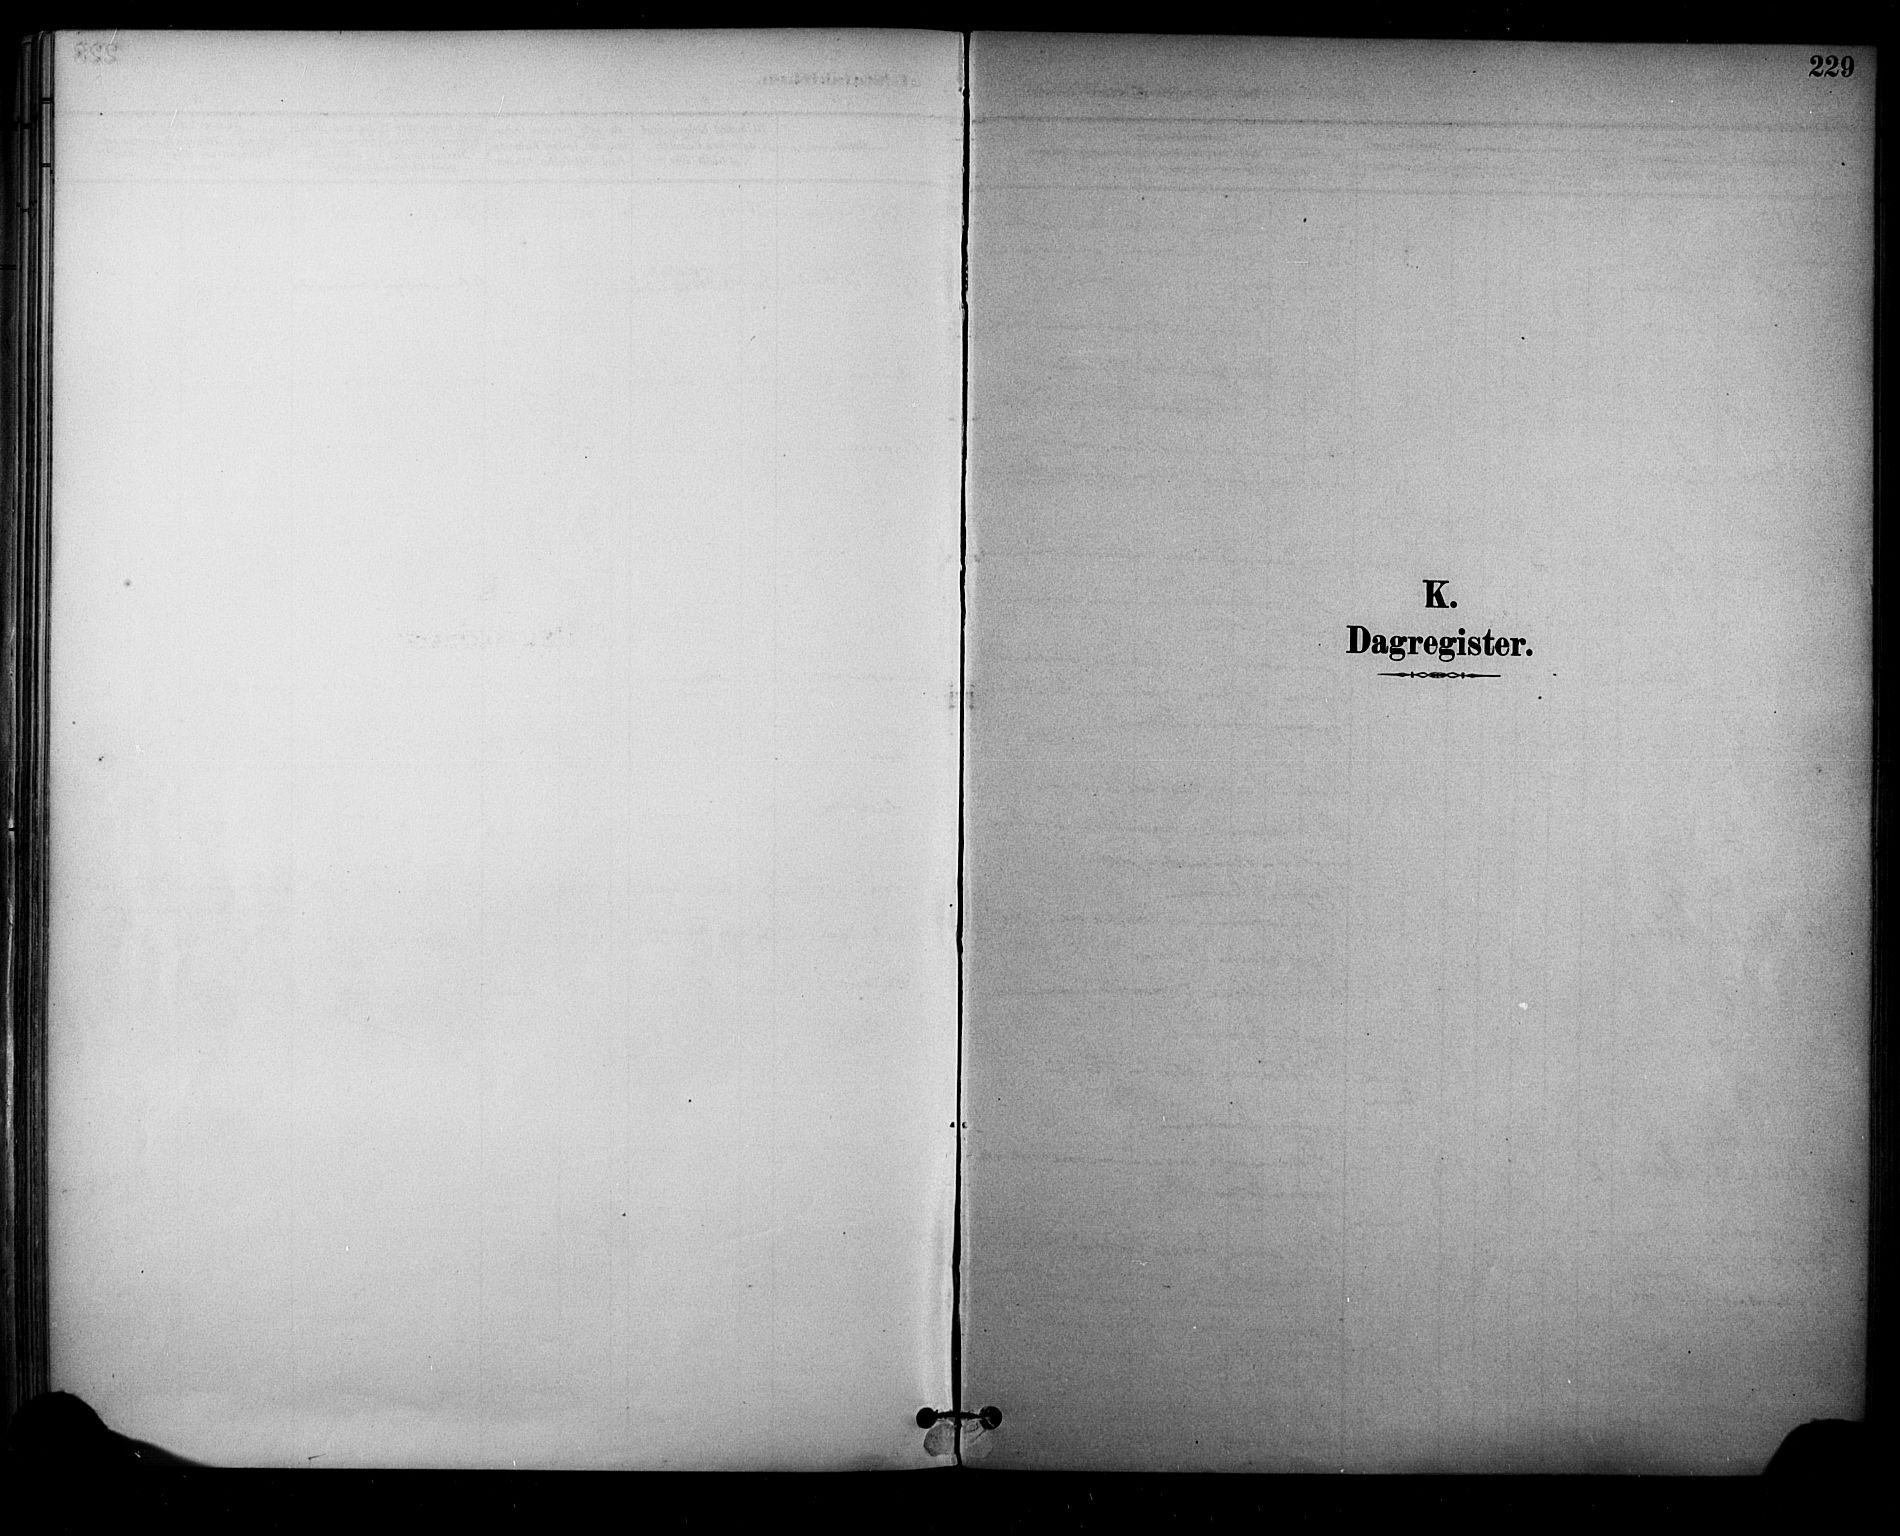 SAKO, Sauherad kirkebøker, F/Fa/L0009: Ministerialbok nr. I 9, 1887-1912, s. 229